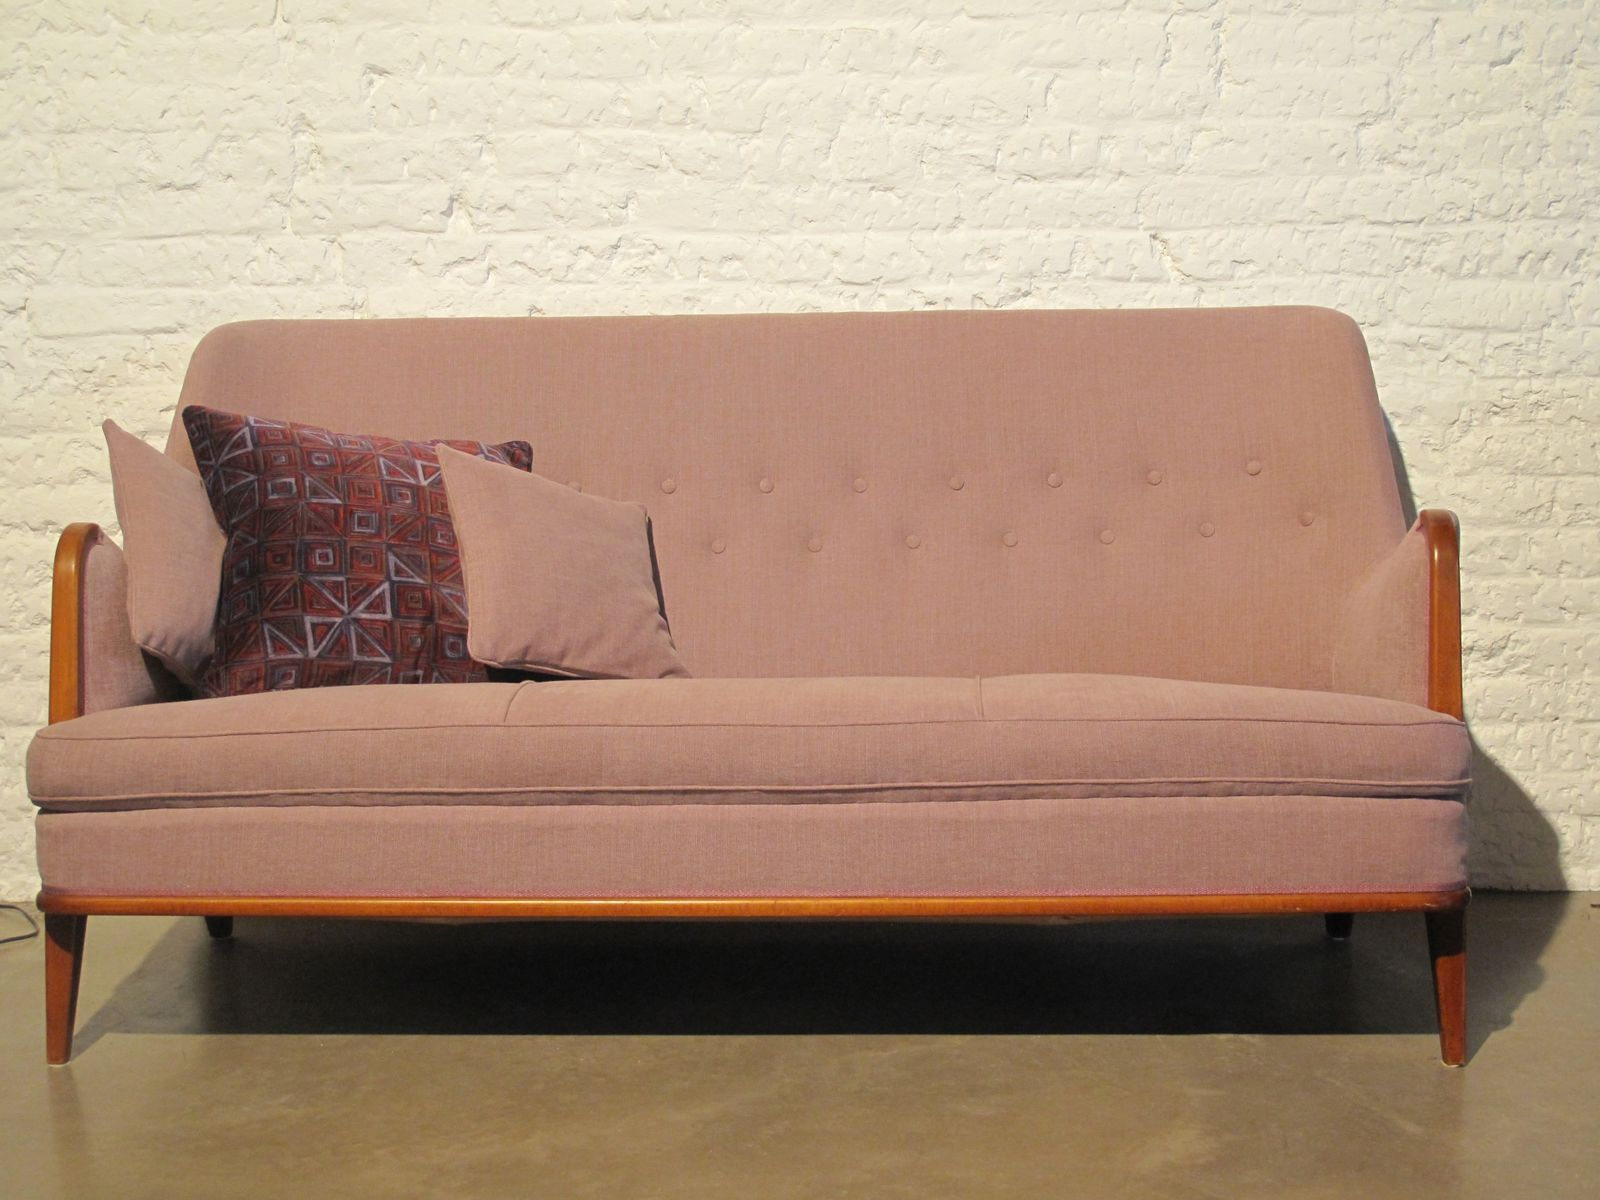 Swedish Sofa By Carl Malmsten 1950s For Sale At Pamono